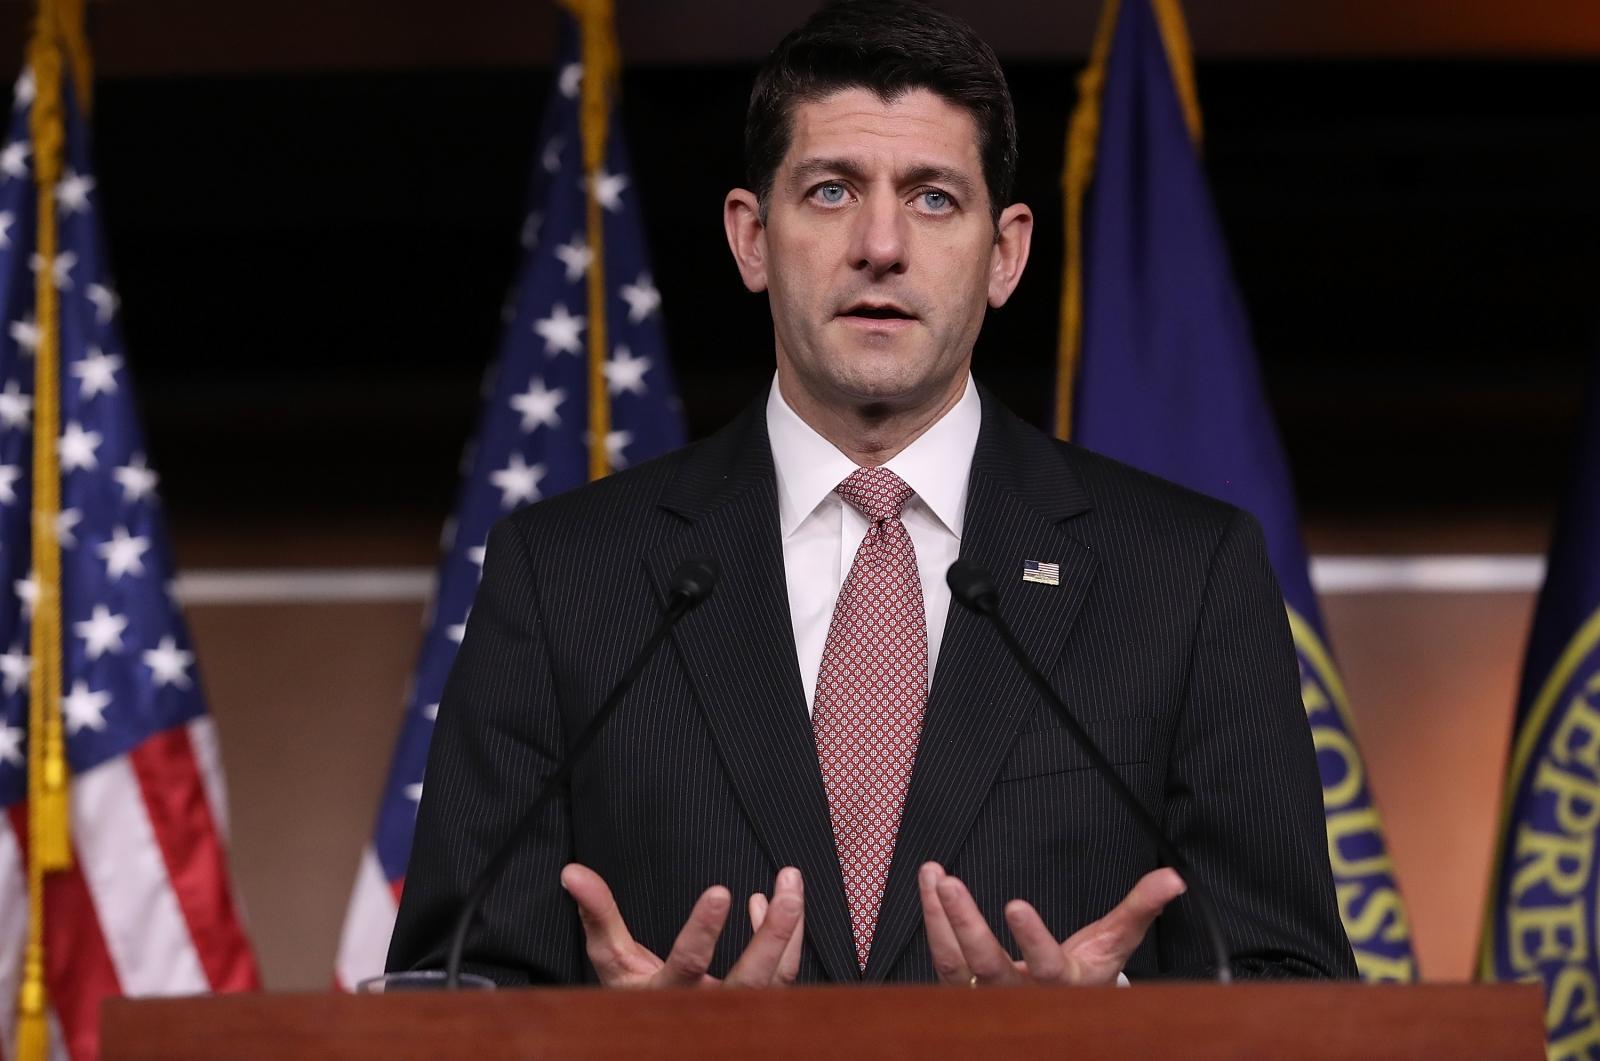 US House Speaker Paul Ryan